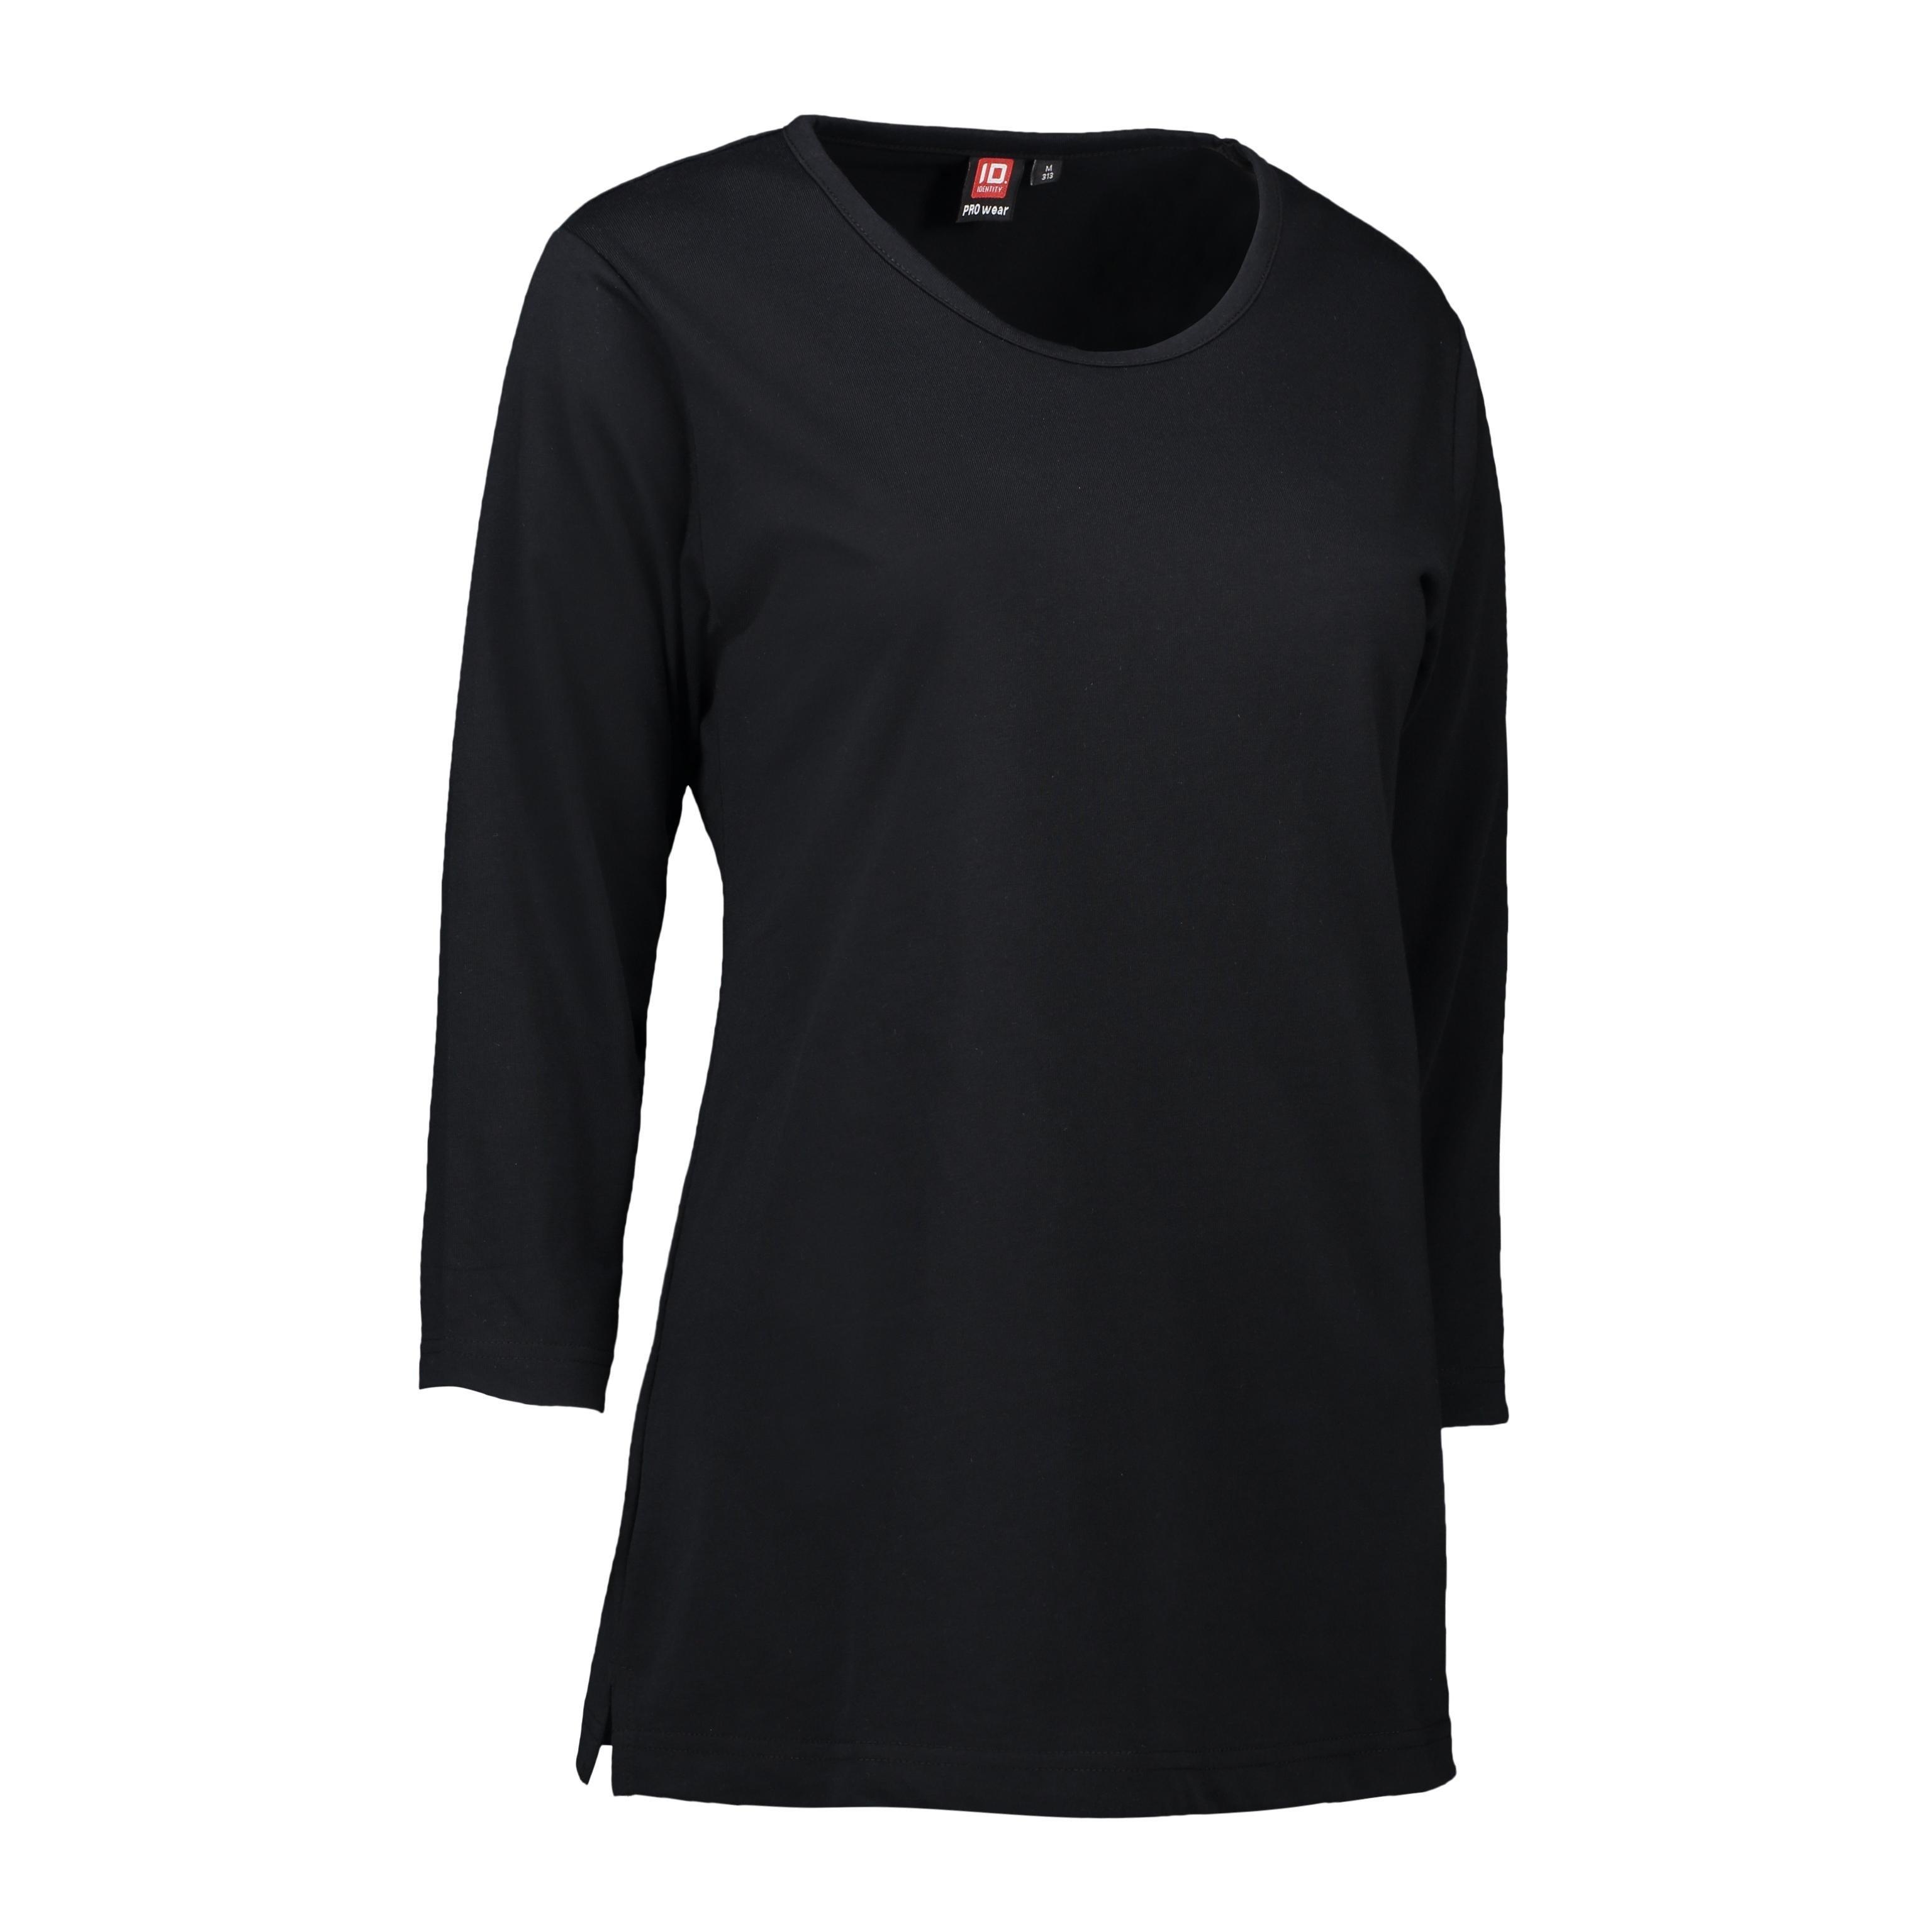 ID PRO Wear dame T shirt| 34 arm 0313